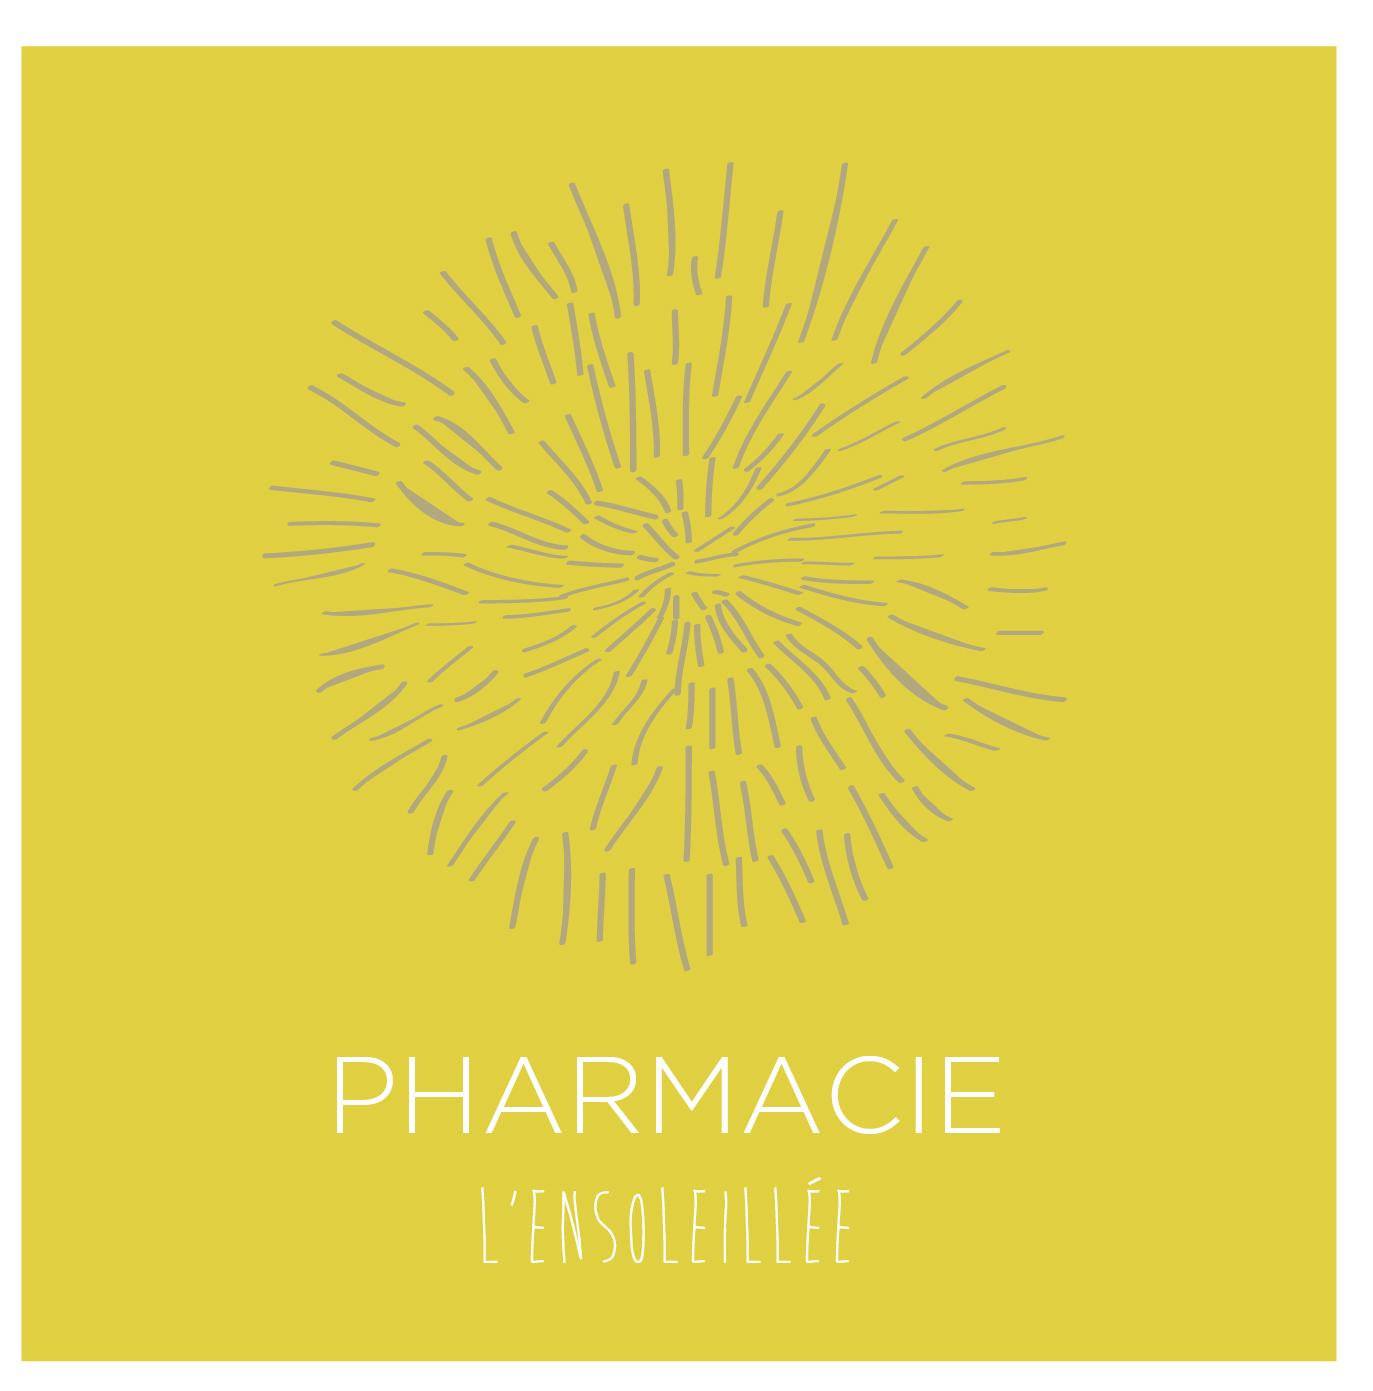 PHARMACIE L'ENSOLEILLEE –  AIX EN PROVENCE (13) 25